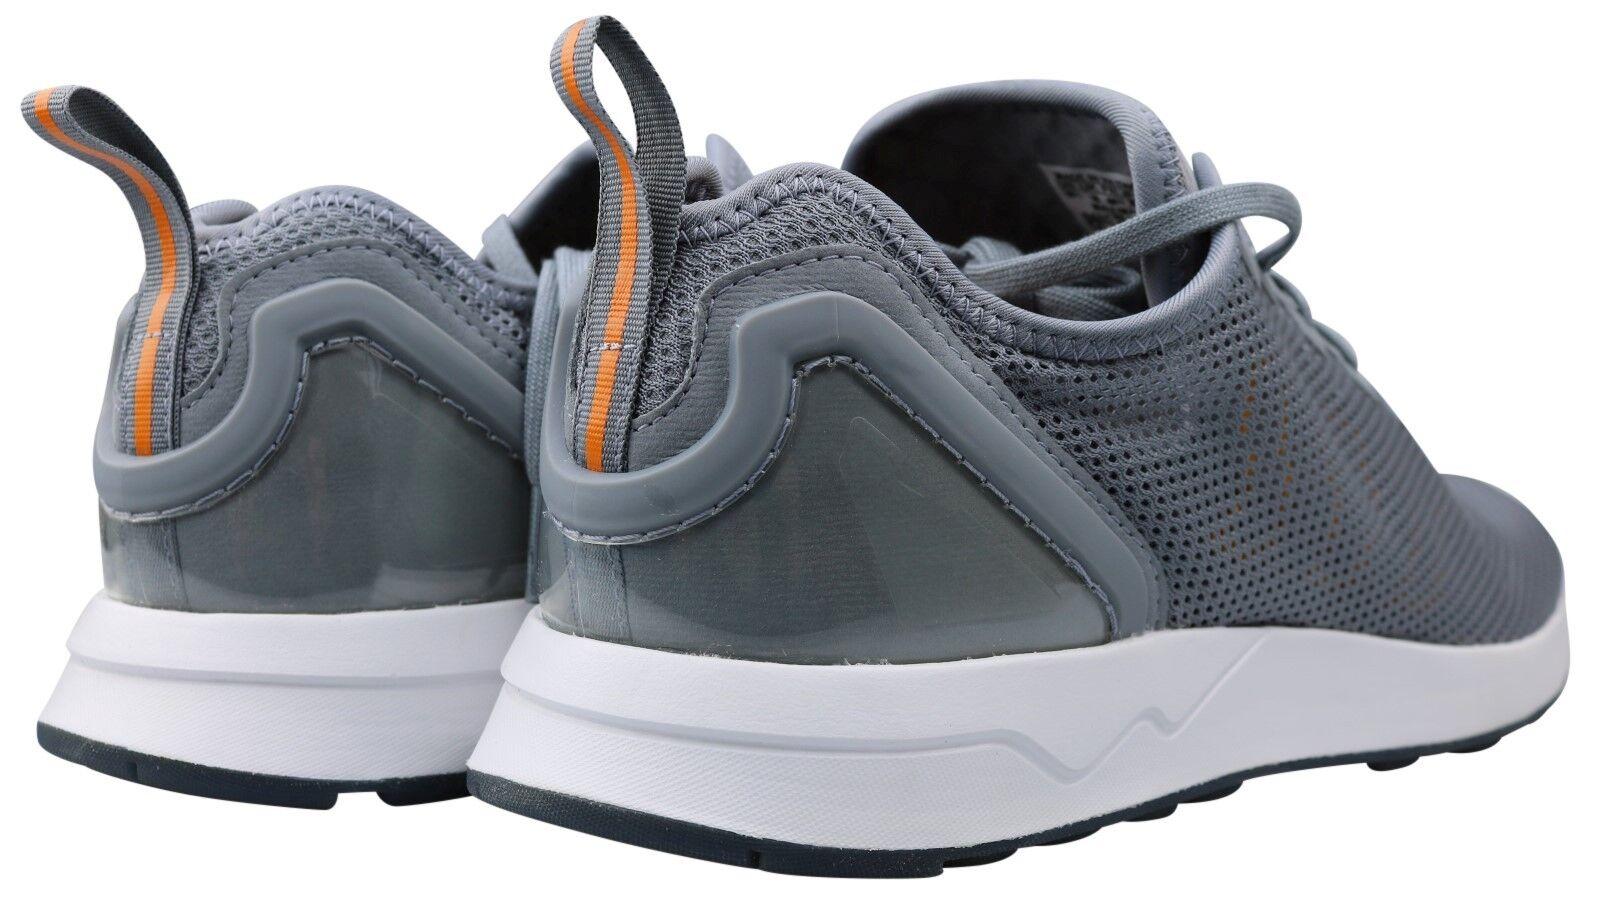 Adidas Super Originals ZX Flux ADV Super Adidas Lite cortos zapatos s76554 GR 39 - 45 nuevo embalaje original 243520